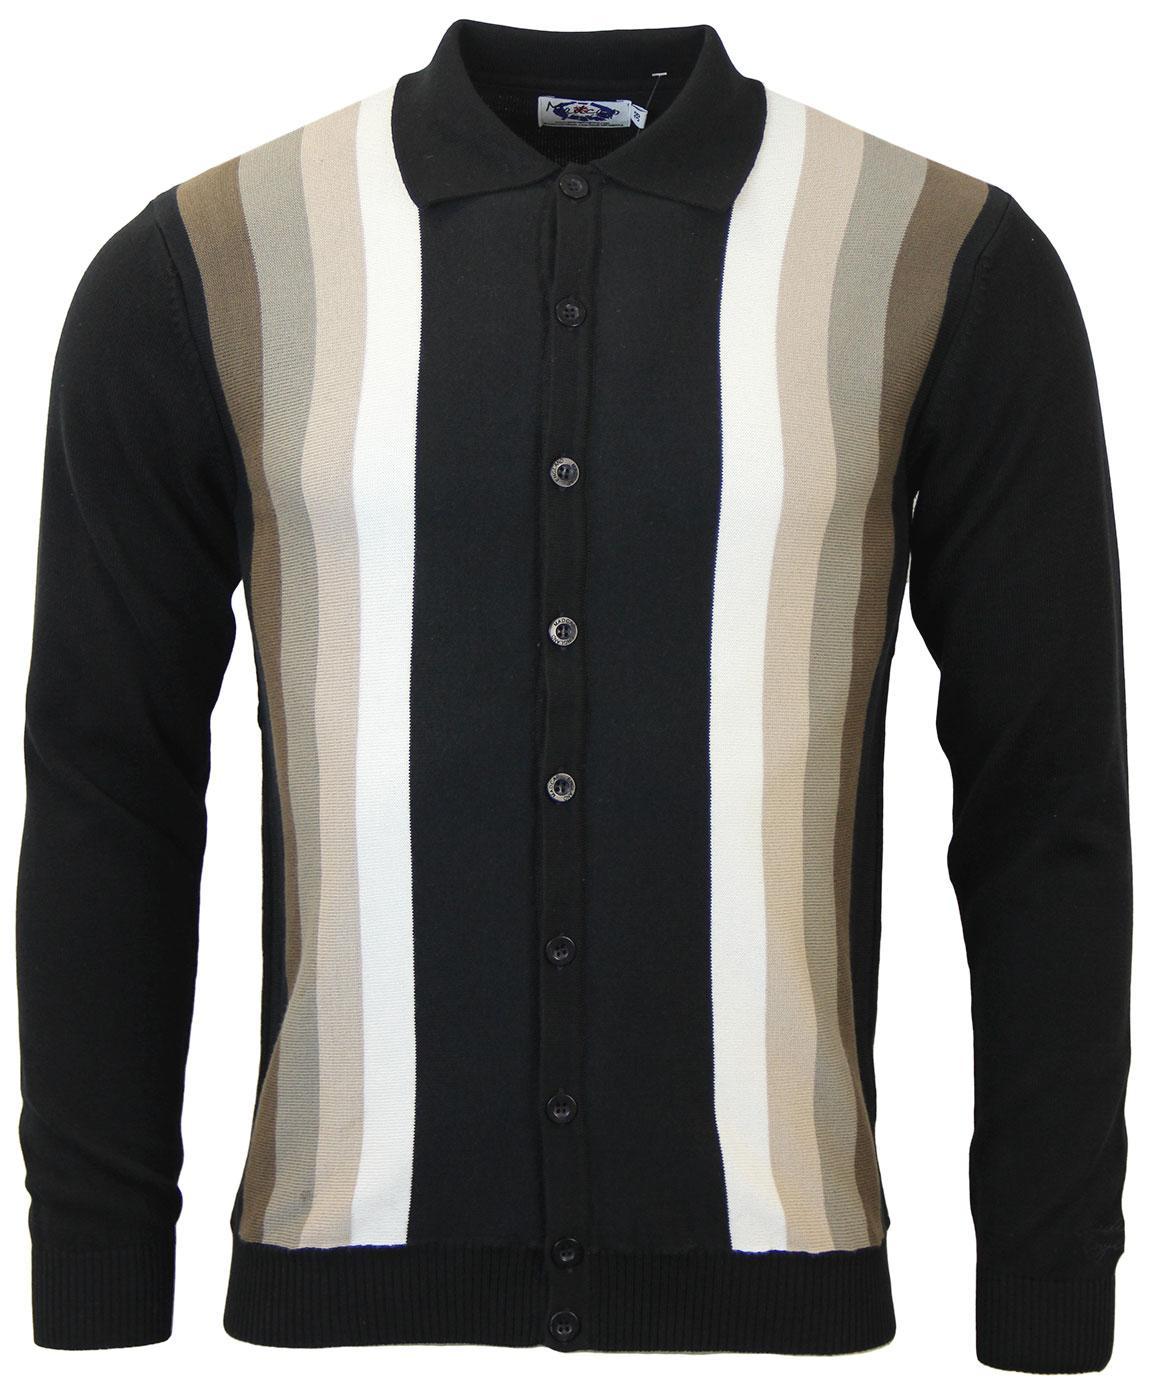 Blake MADCAP ENGLAND Mod Gradient Polo Cardigan BN